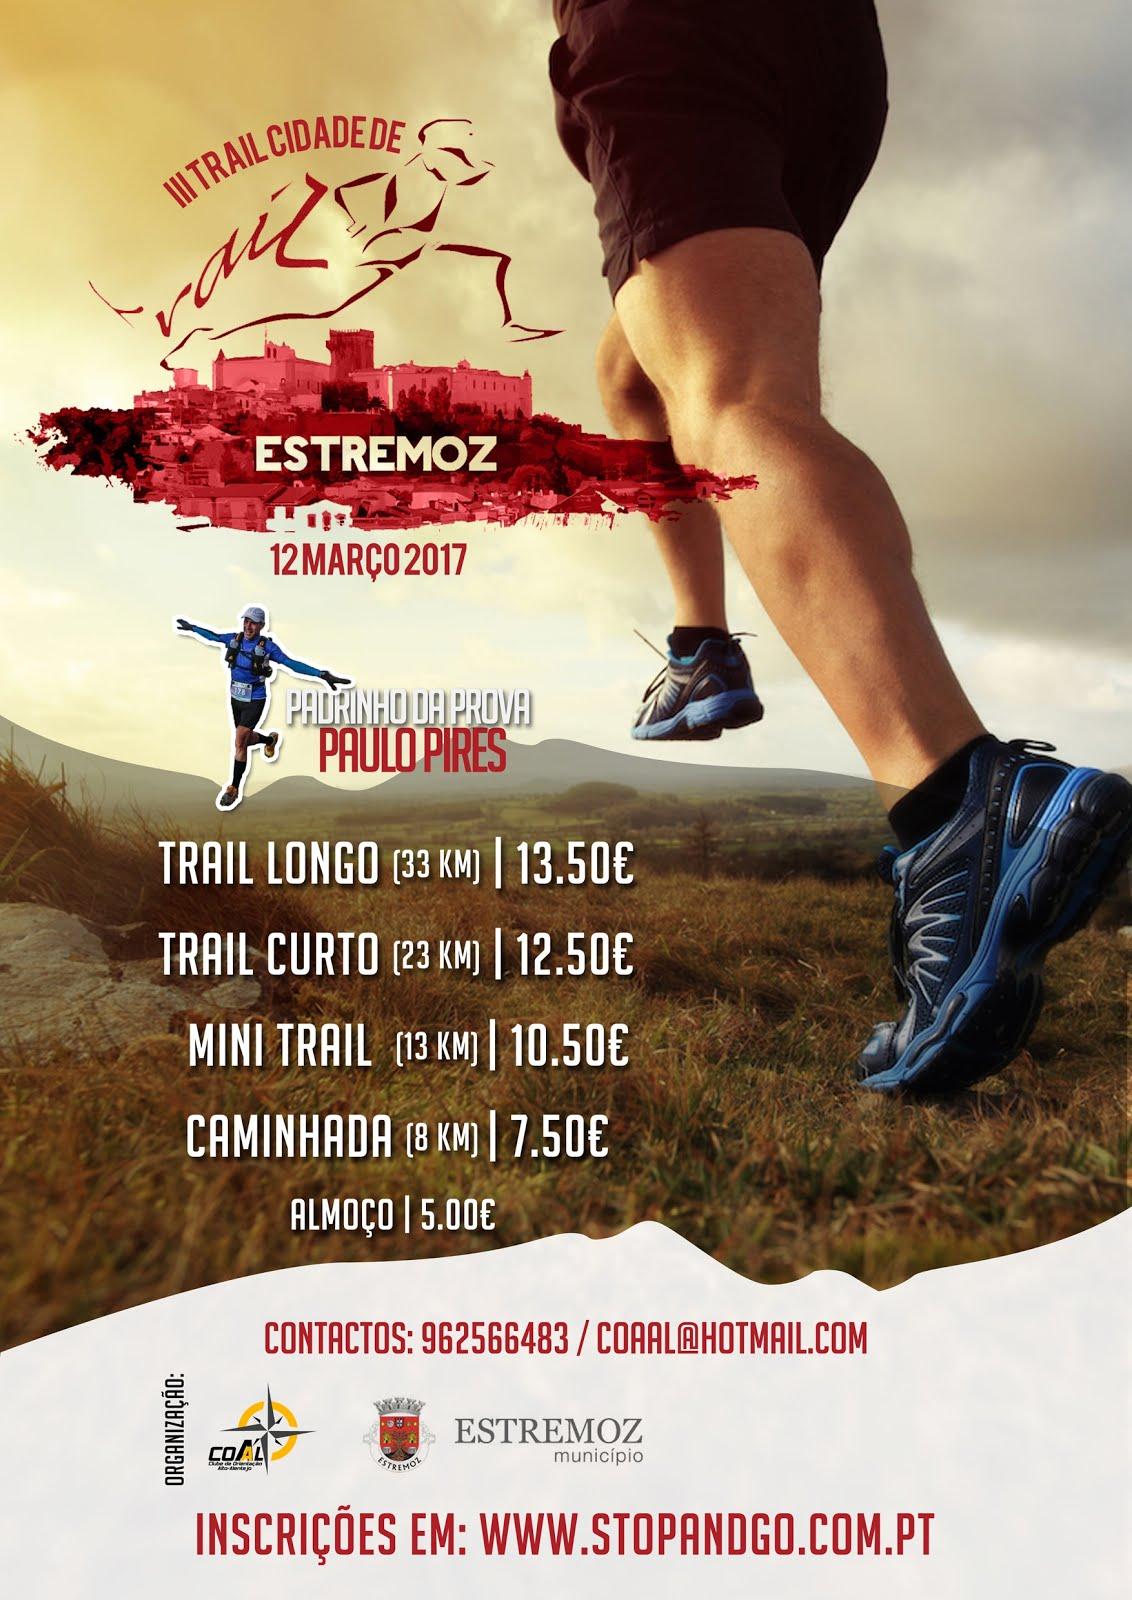 Trail de Estremoz, 12/3/2017